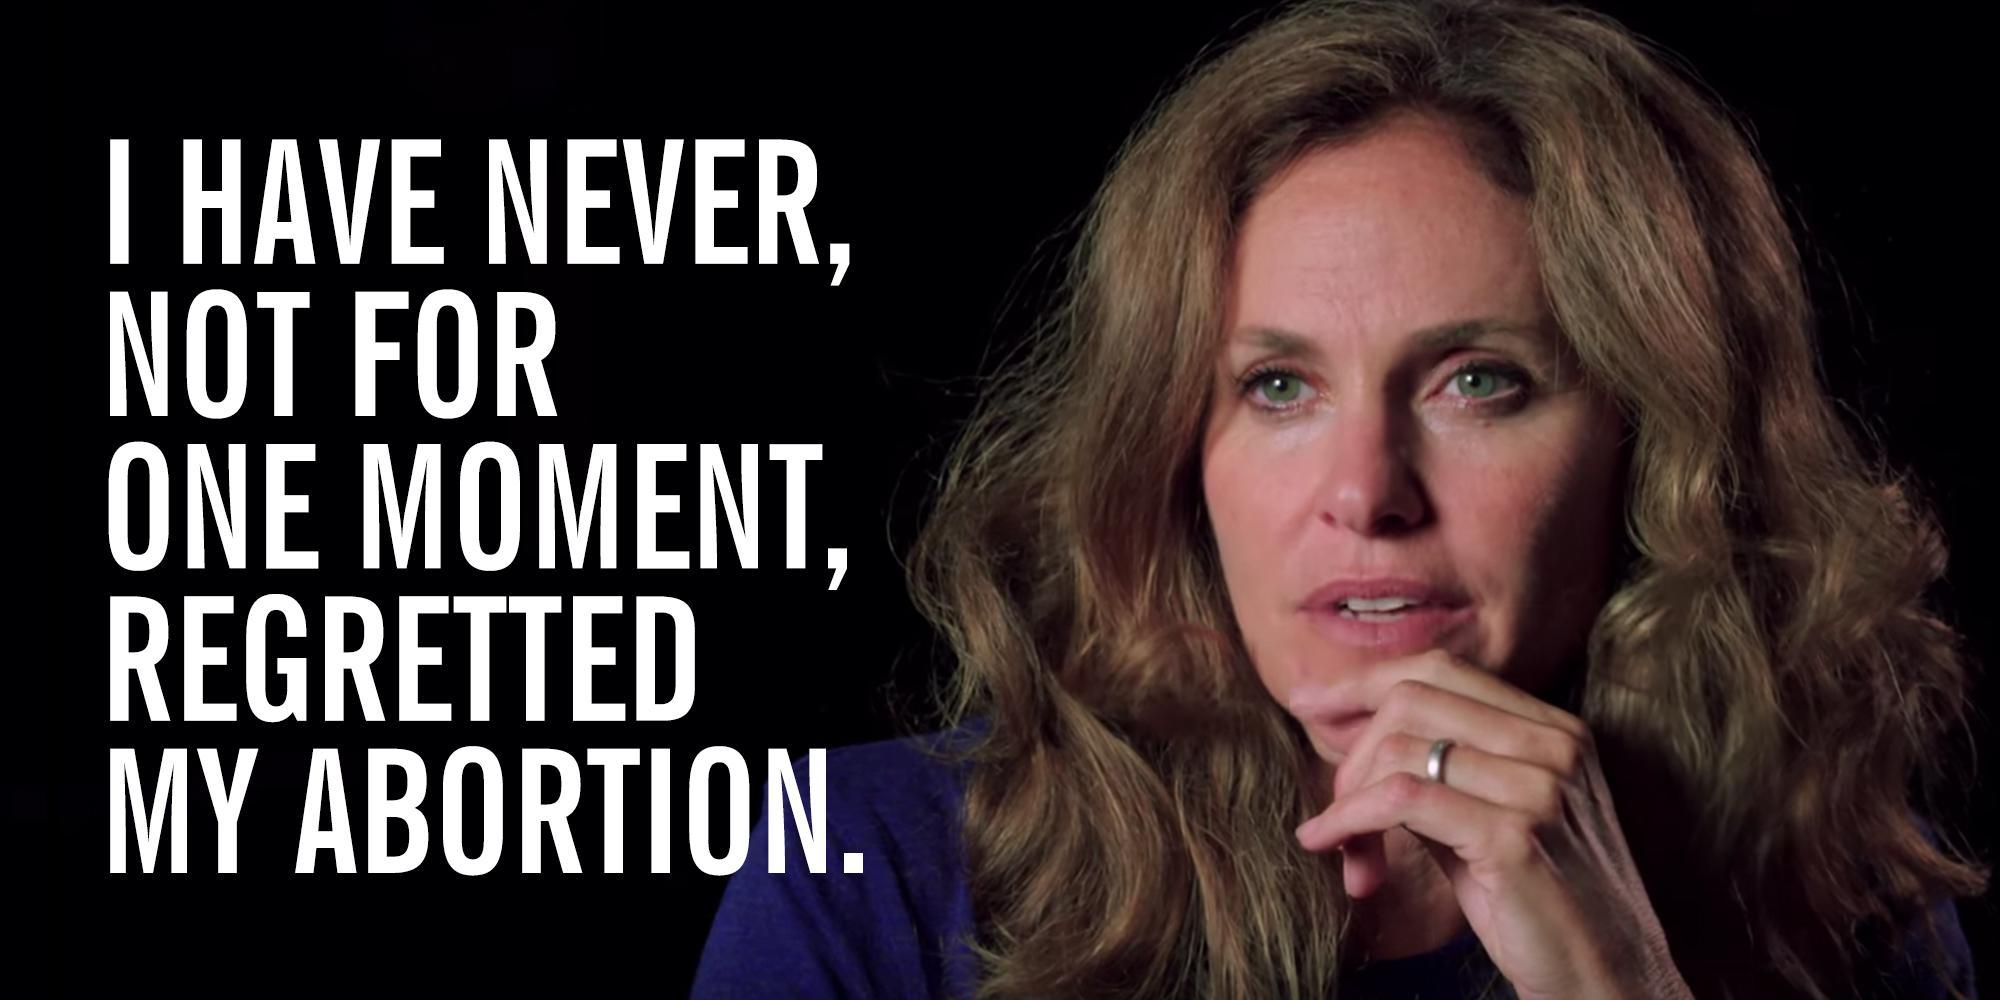 amy brenneman  why i u0026 39 m sharing my abortion story